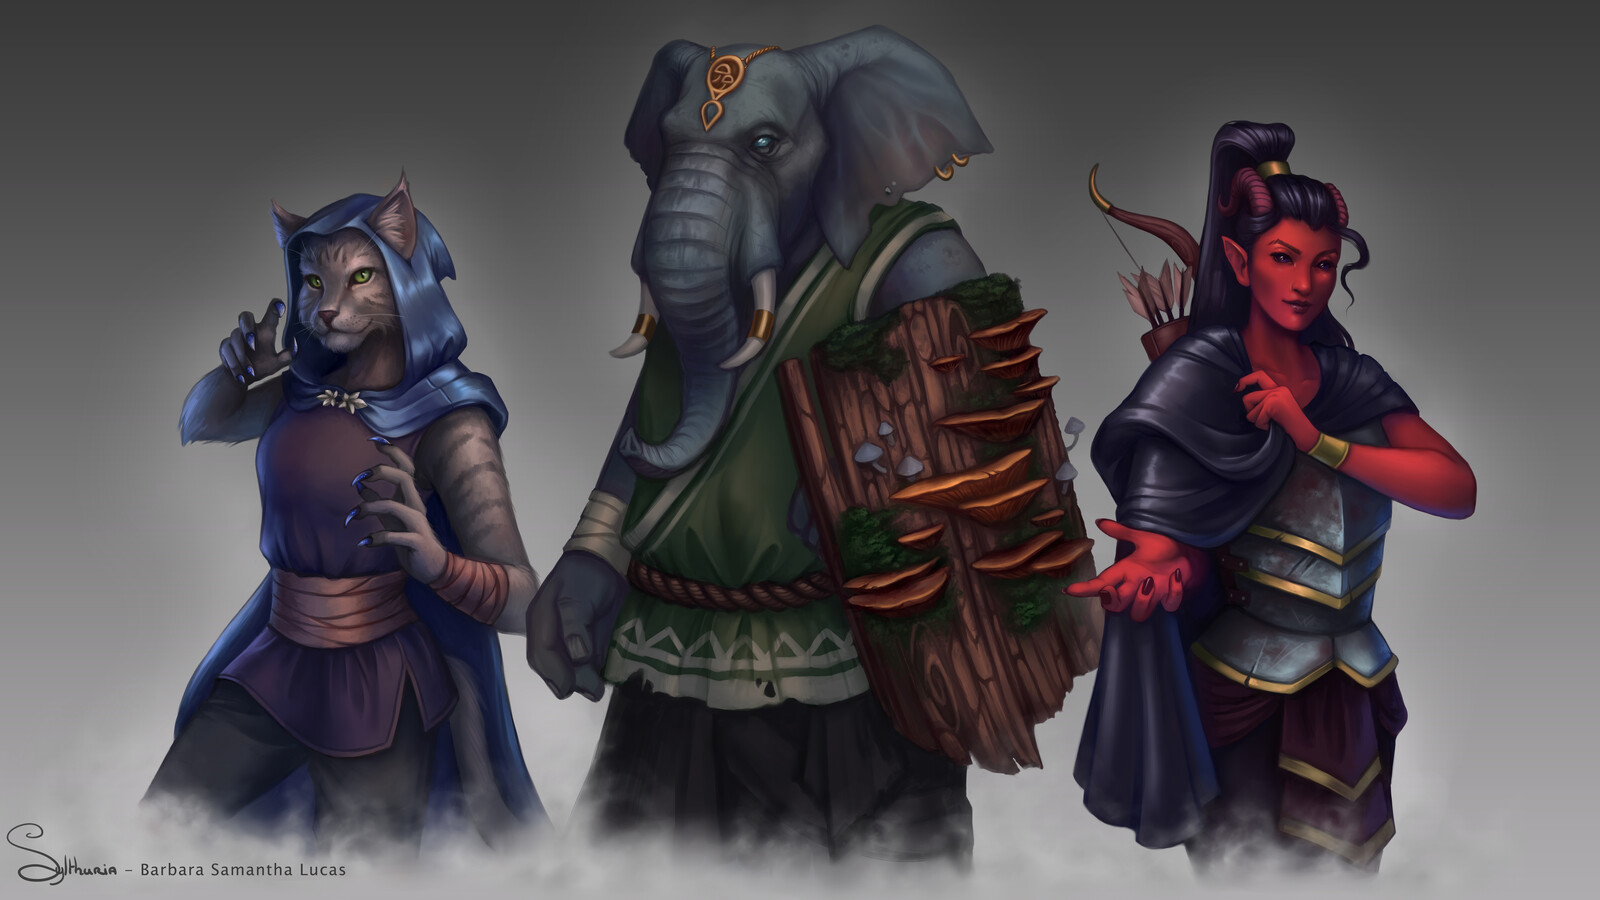 TTRPG group